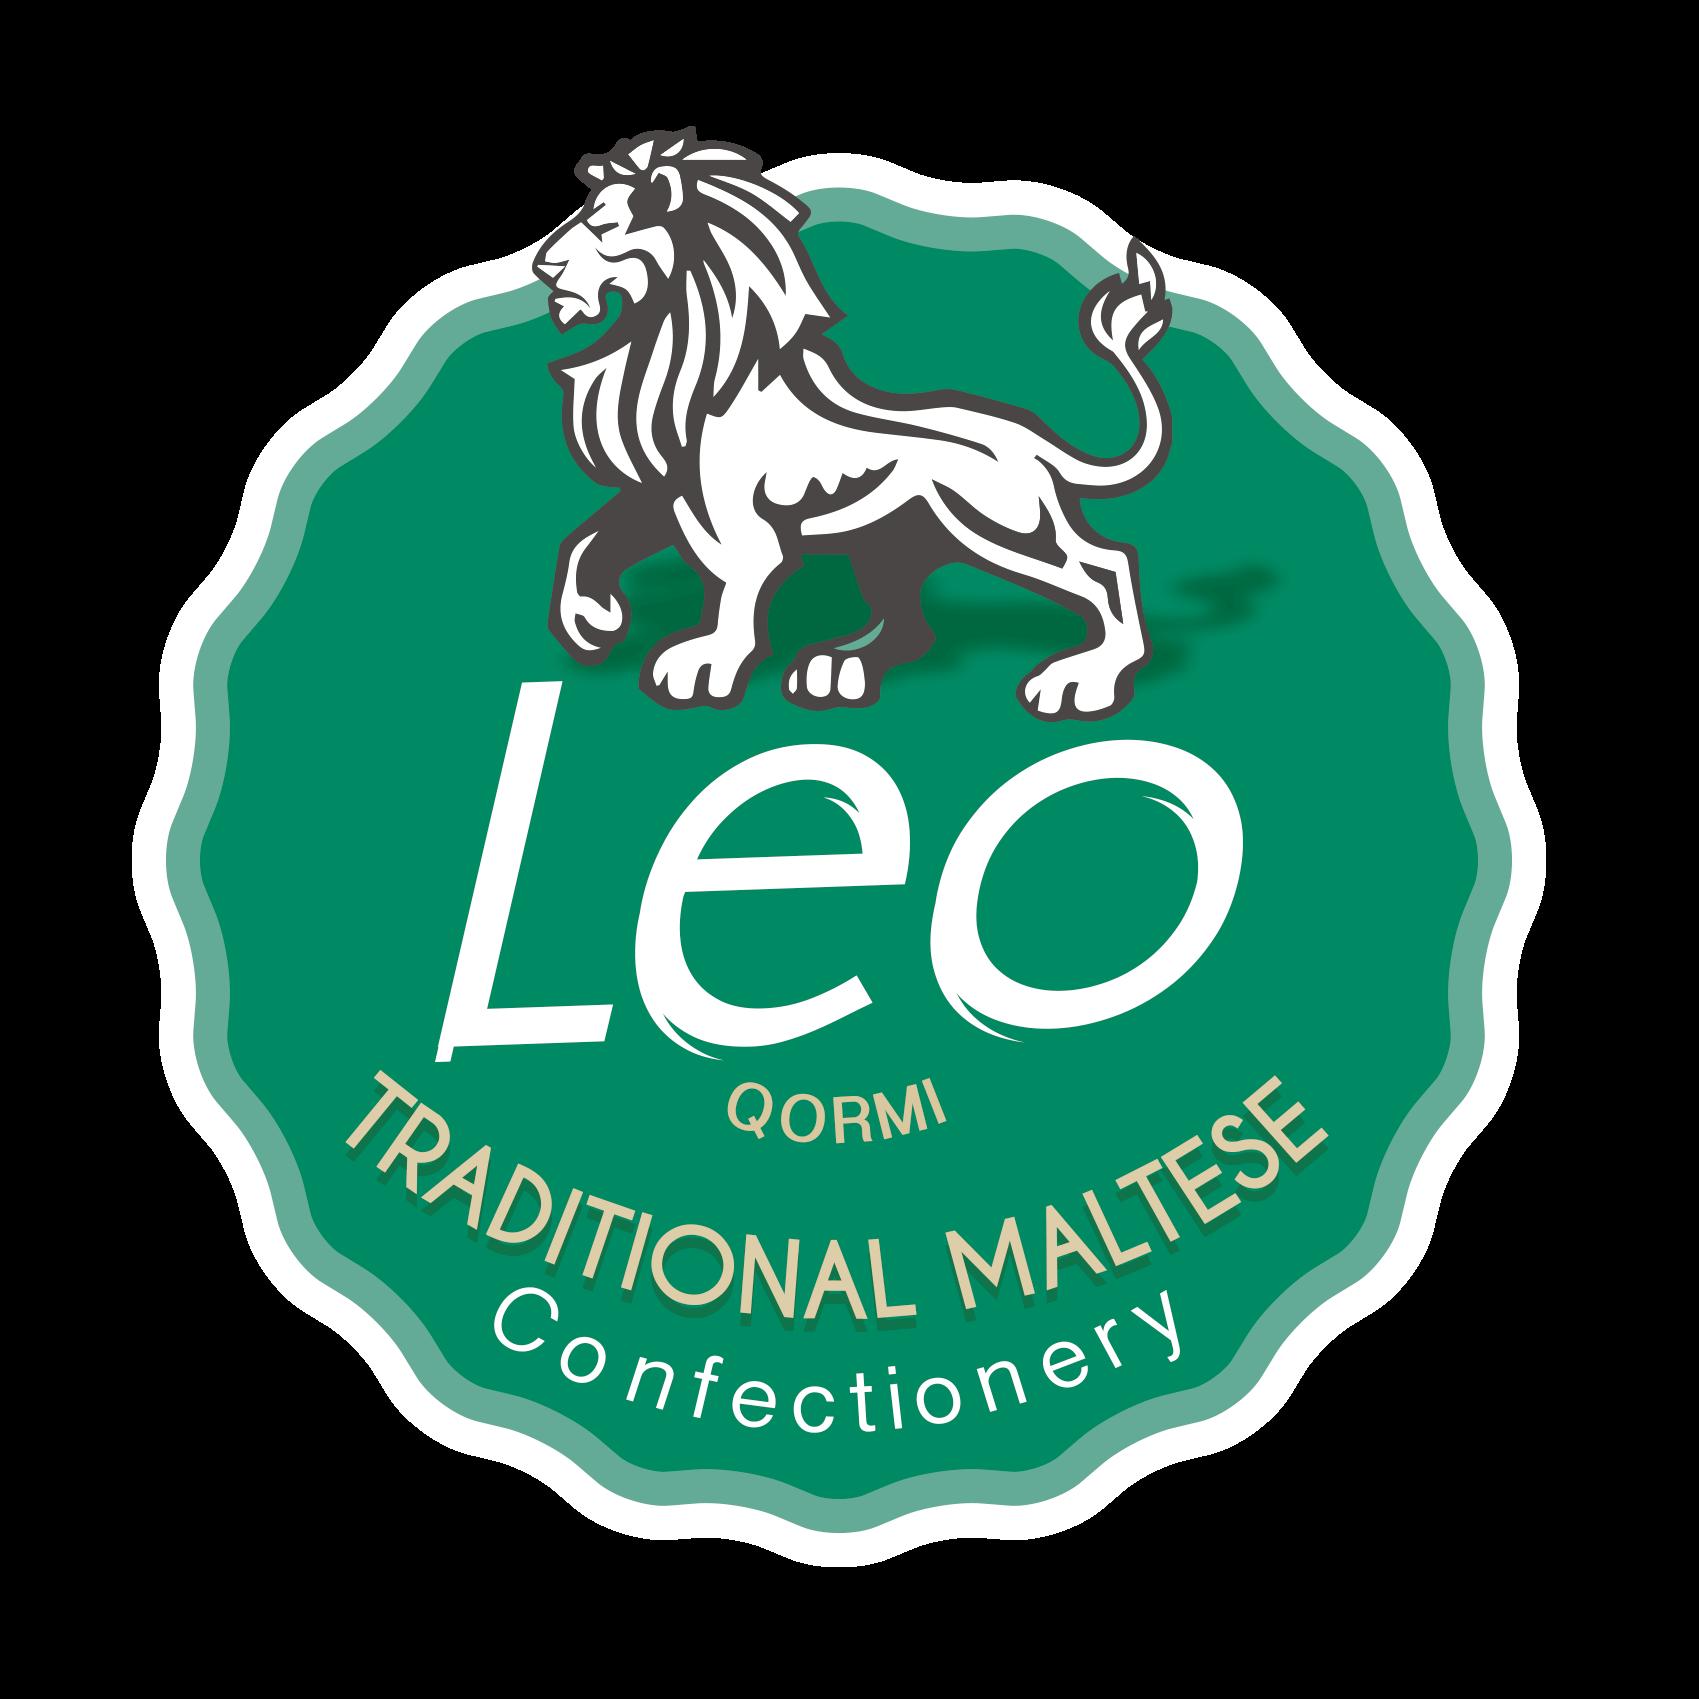 Leo Confectionery